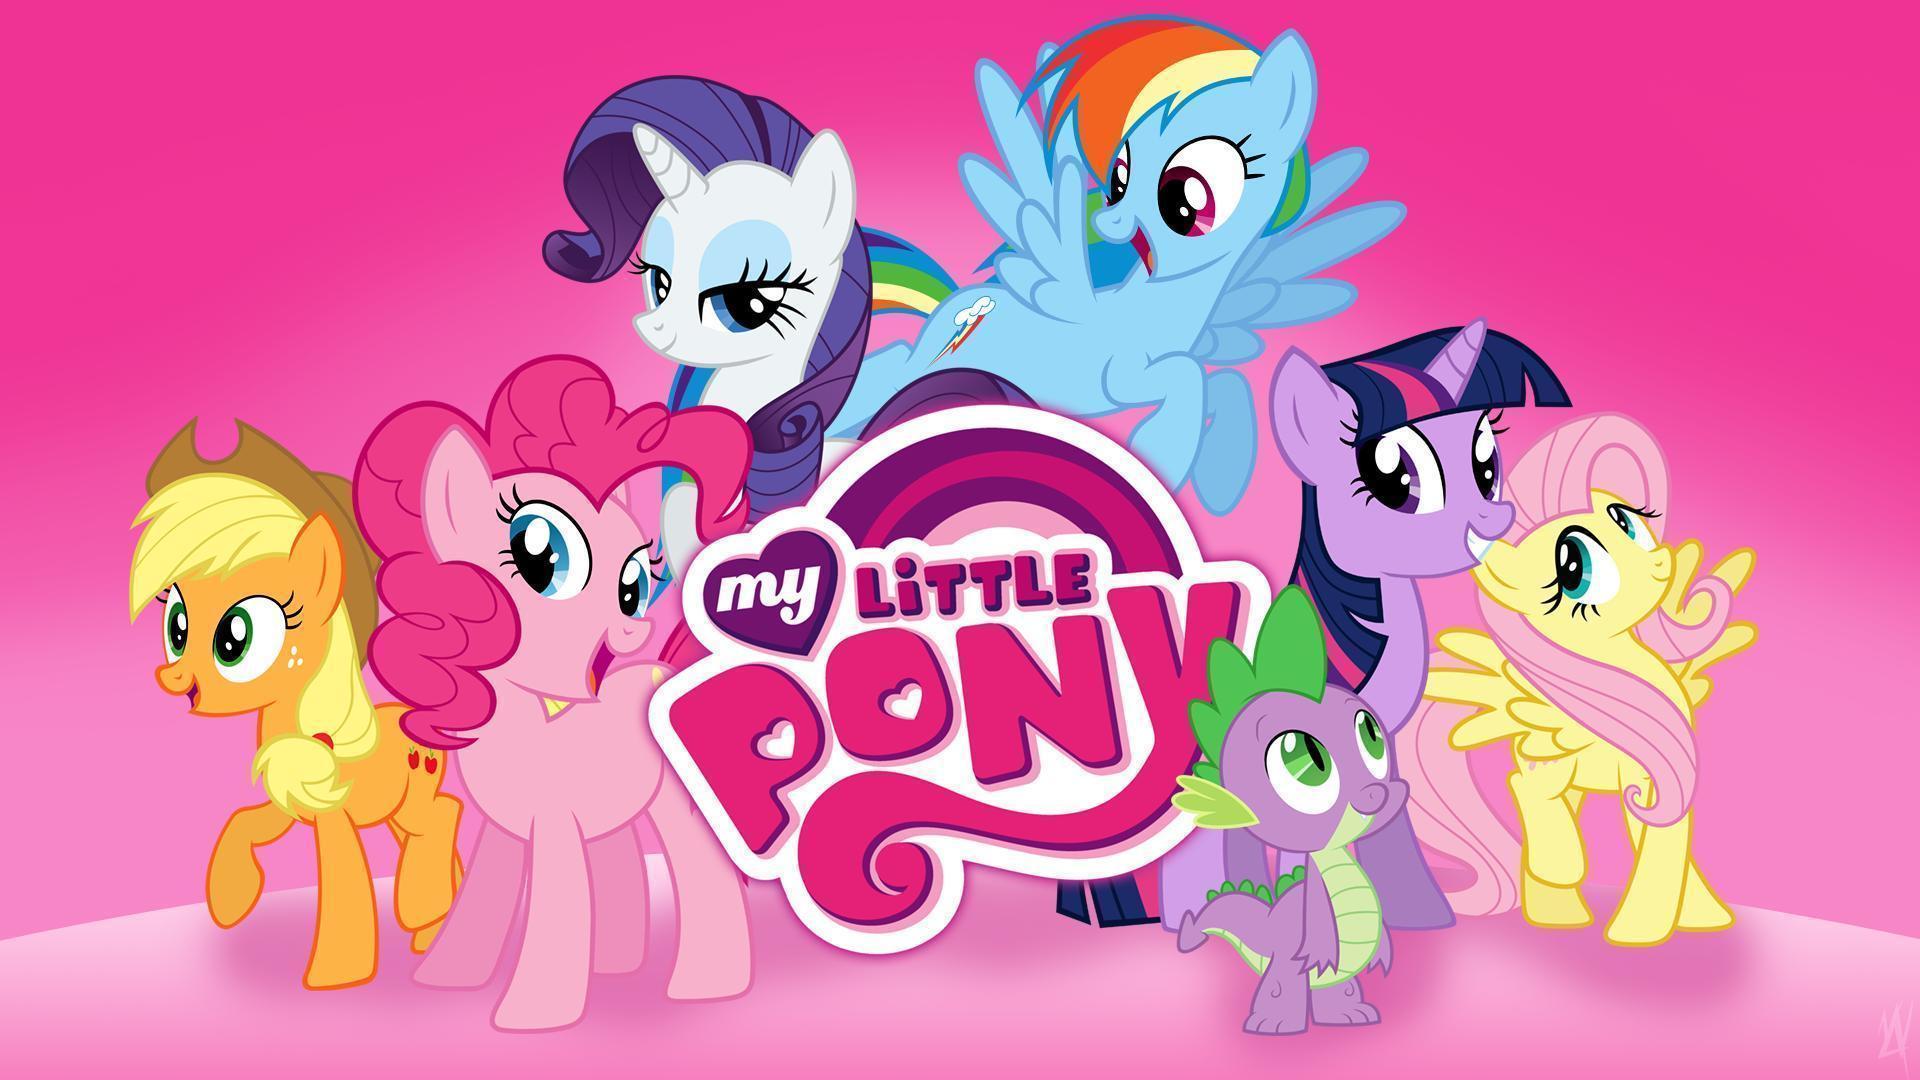 My Little Pony Screensaver